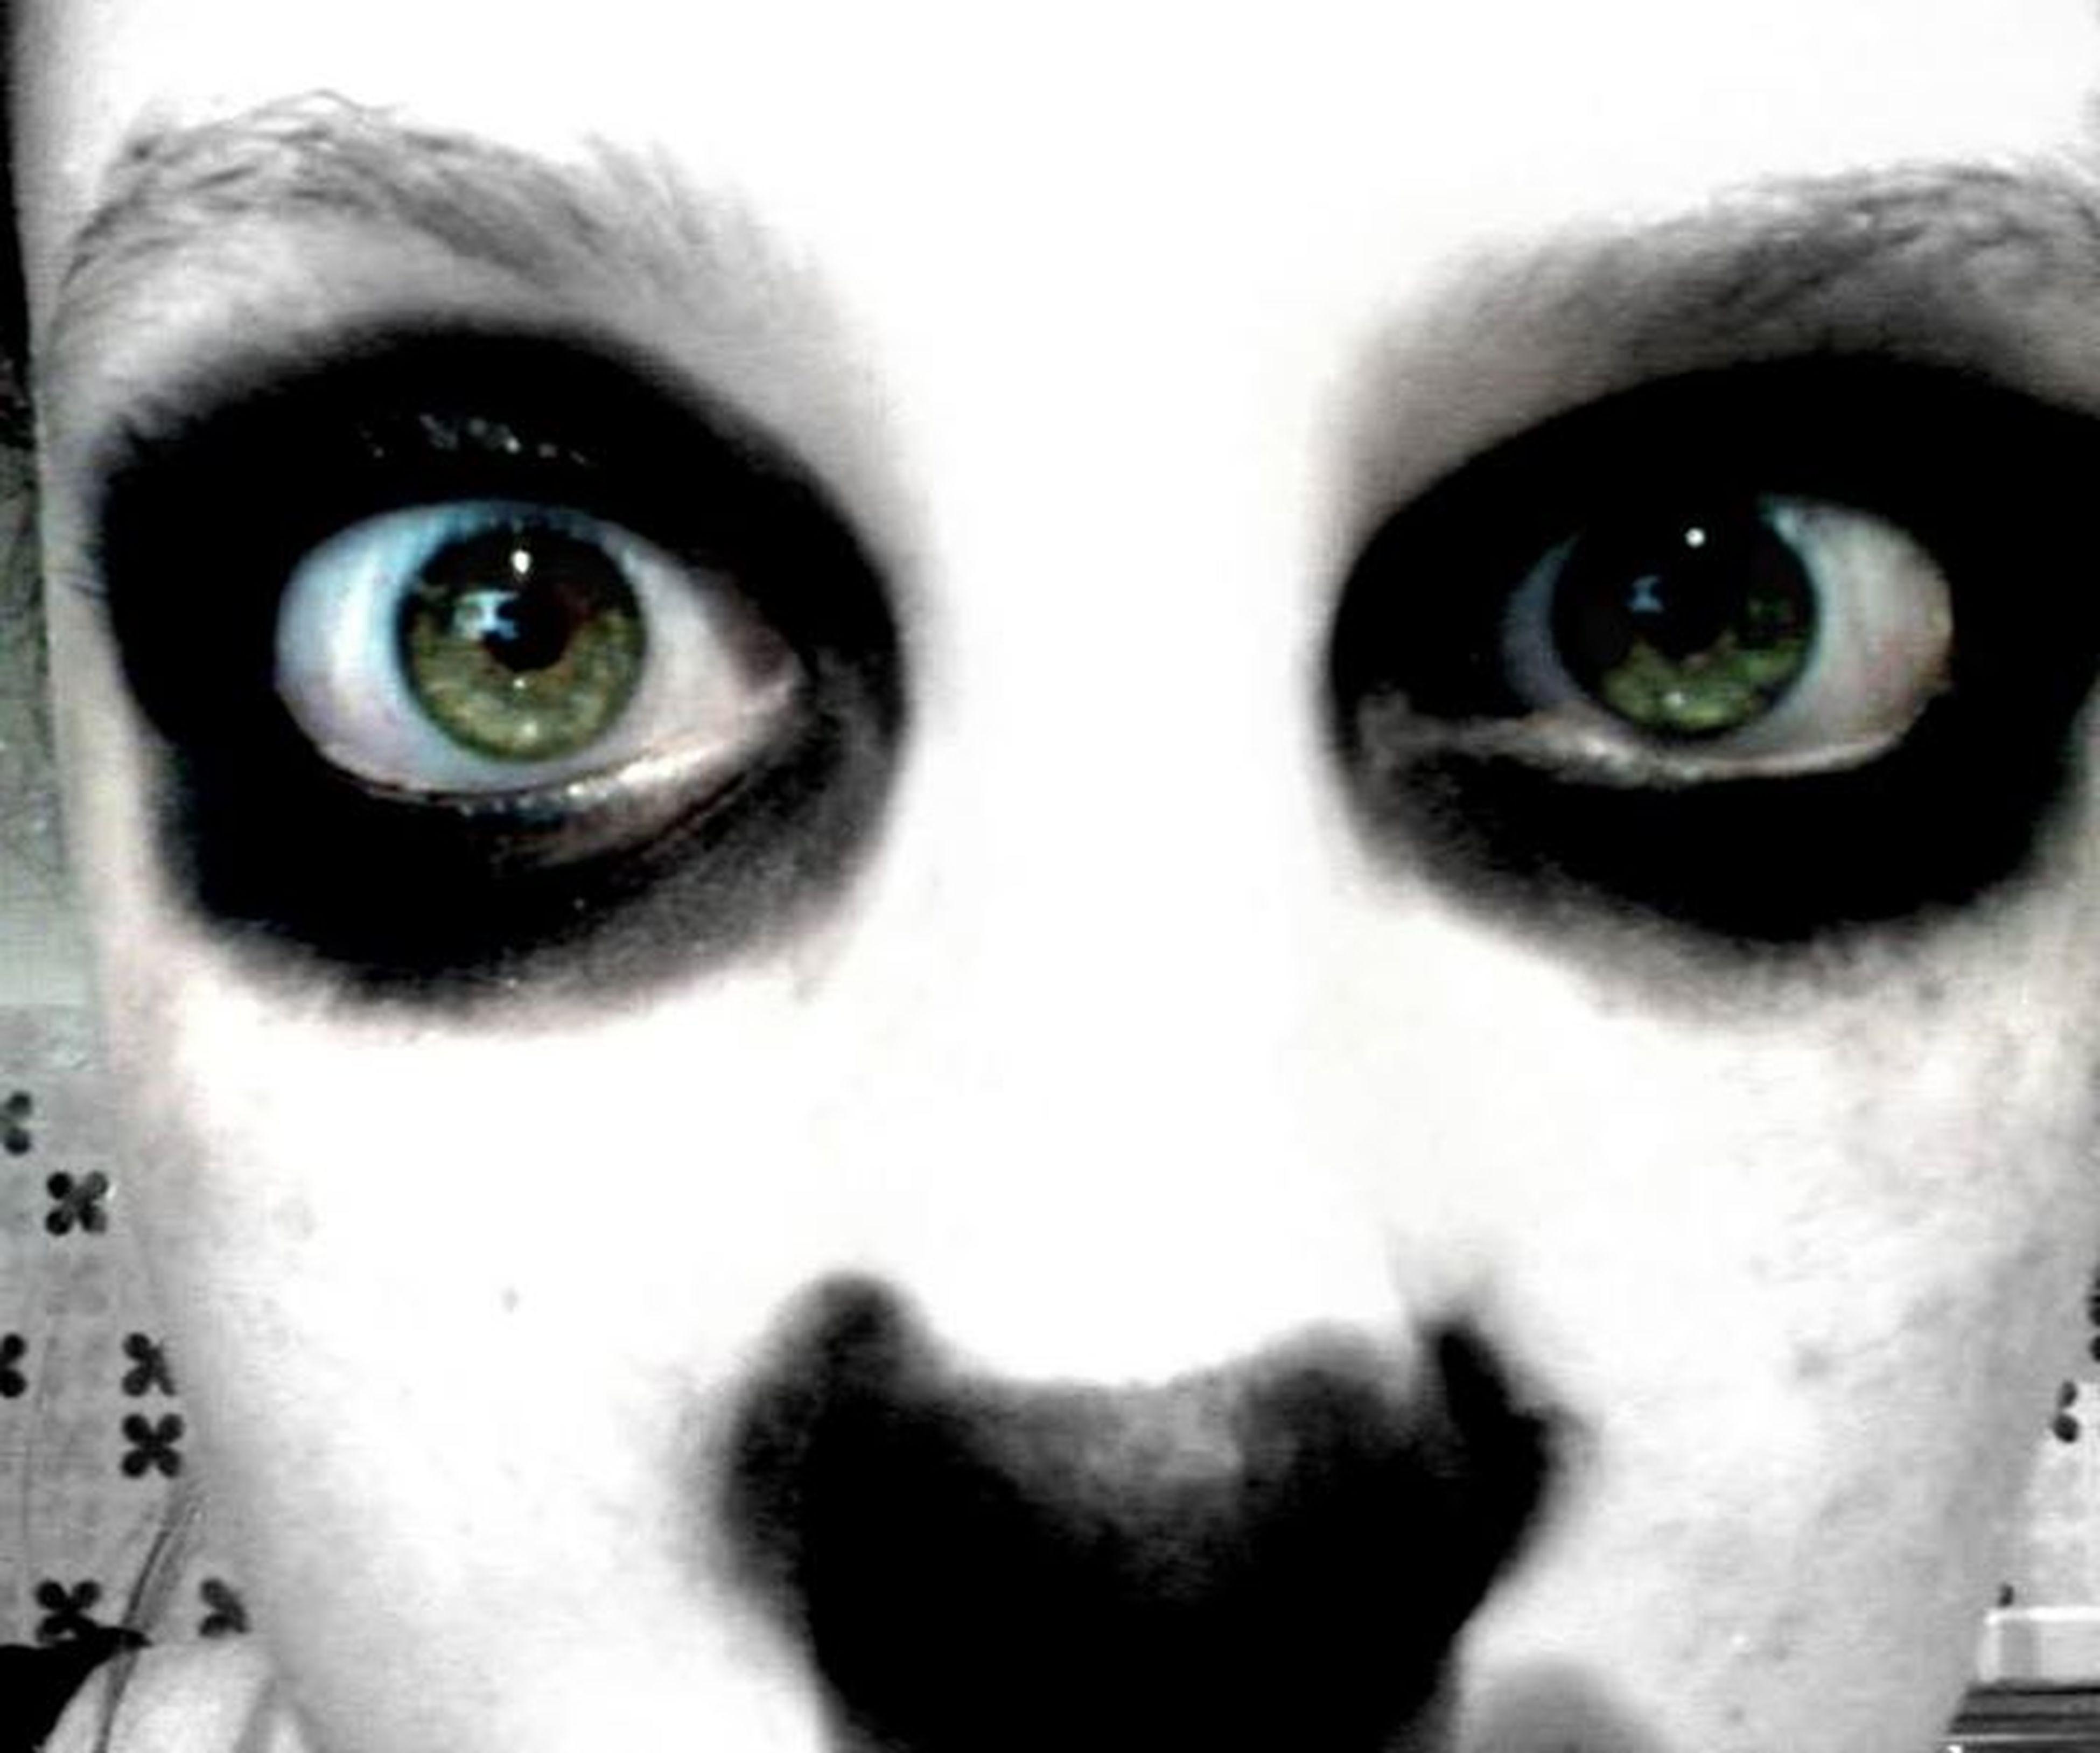 looking at camera, portrait, close-up, human eye, human face, indoors, headshot, full frame, staring, eyelash, extreme close up, part of, extreme close-up, front view, eyesight, backgrounds, detail